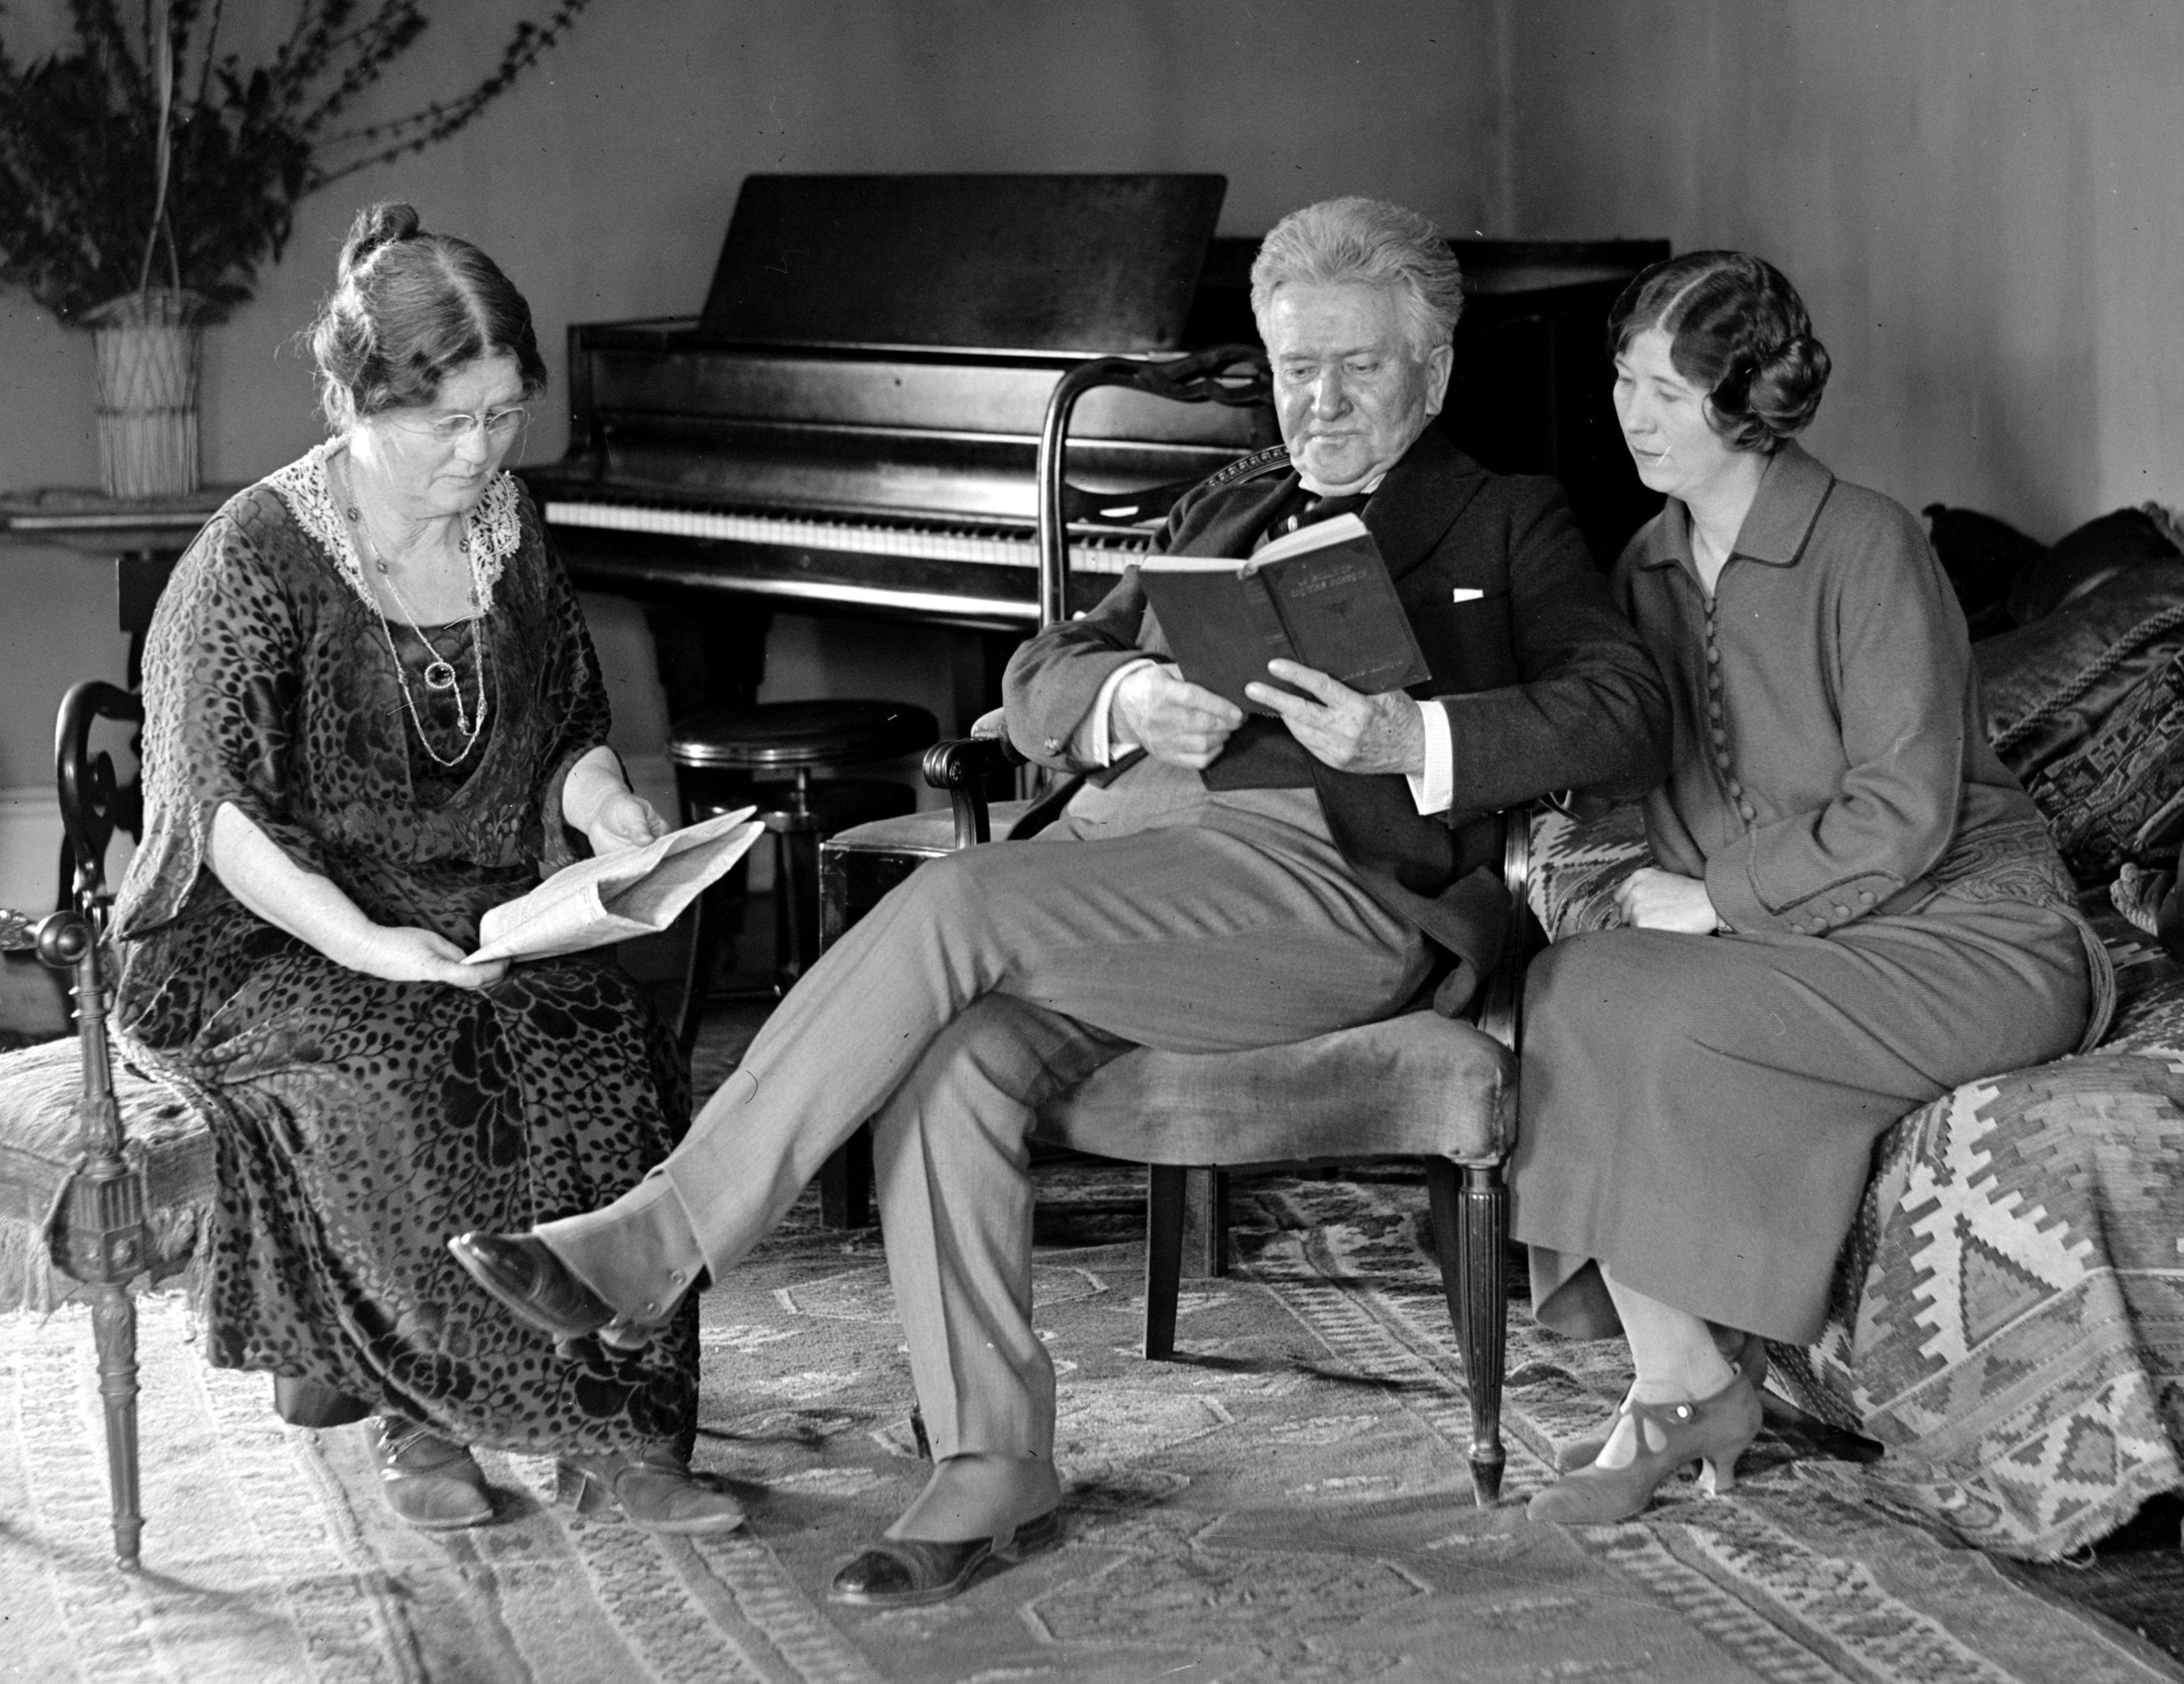 Fil:La-Follette-and-family-1924.jpeg